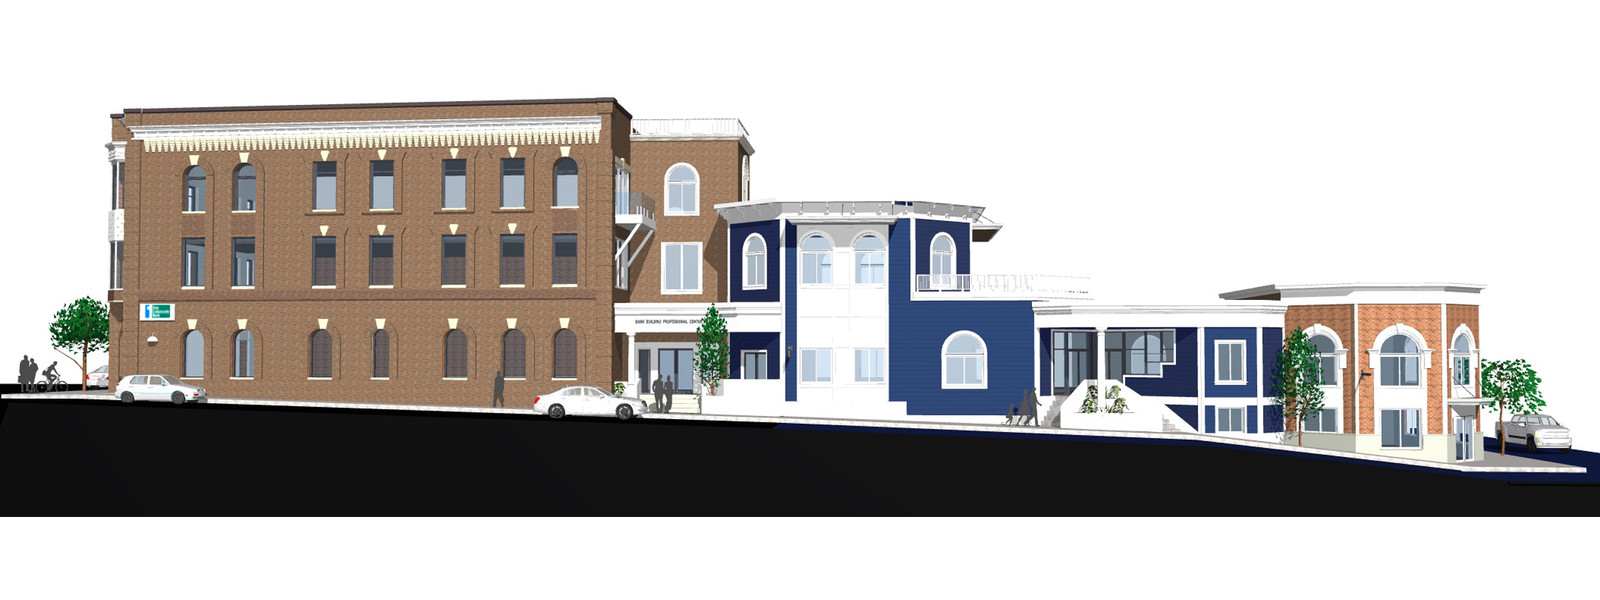 HS-BANK-STREET-SCAPE-WEB.jpg